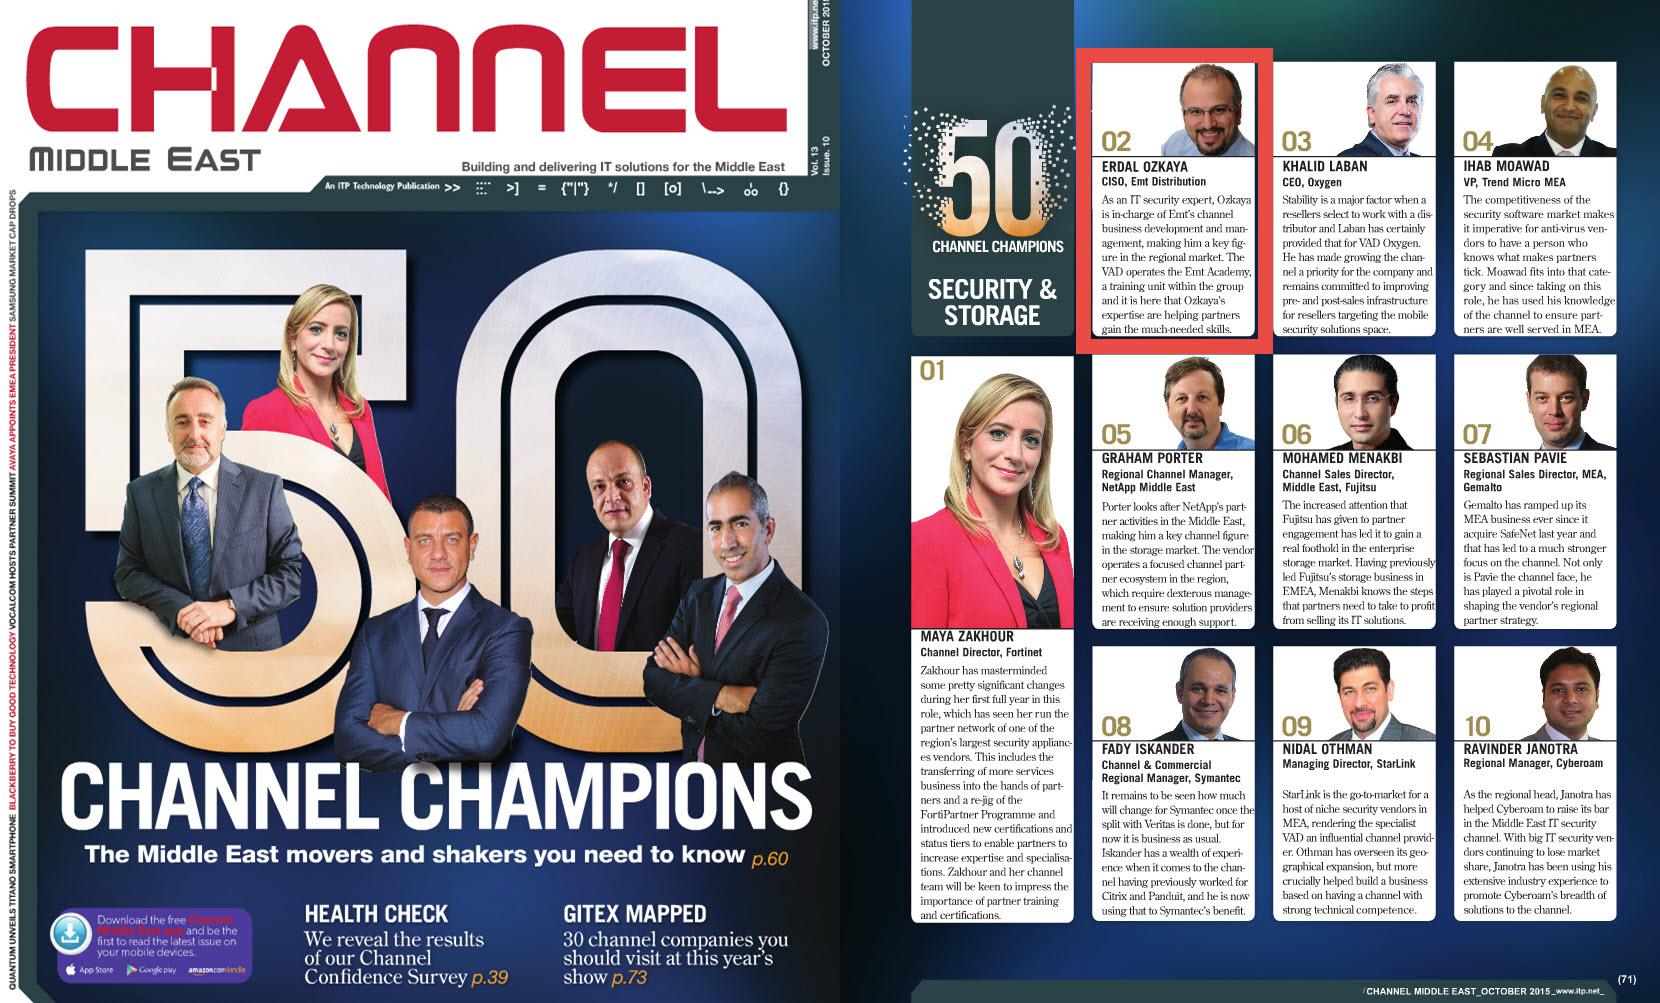 Channel Champions 2015